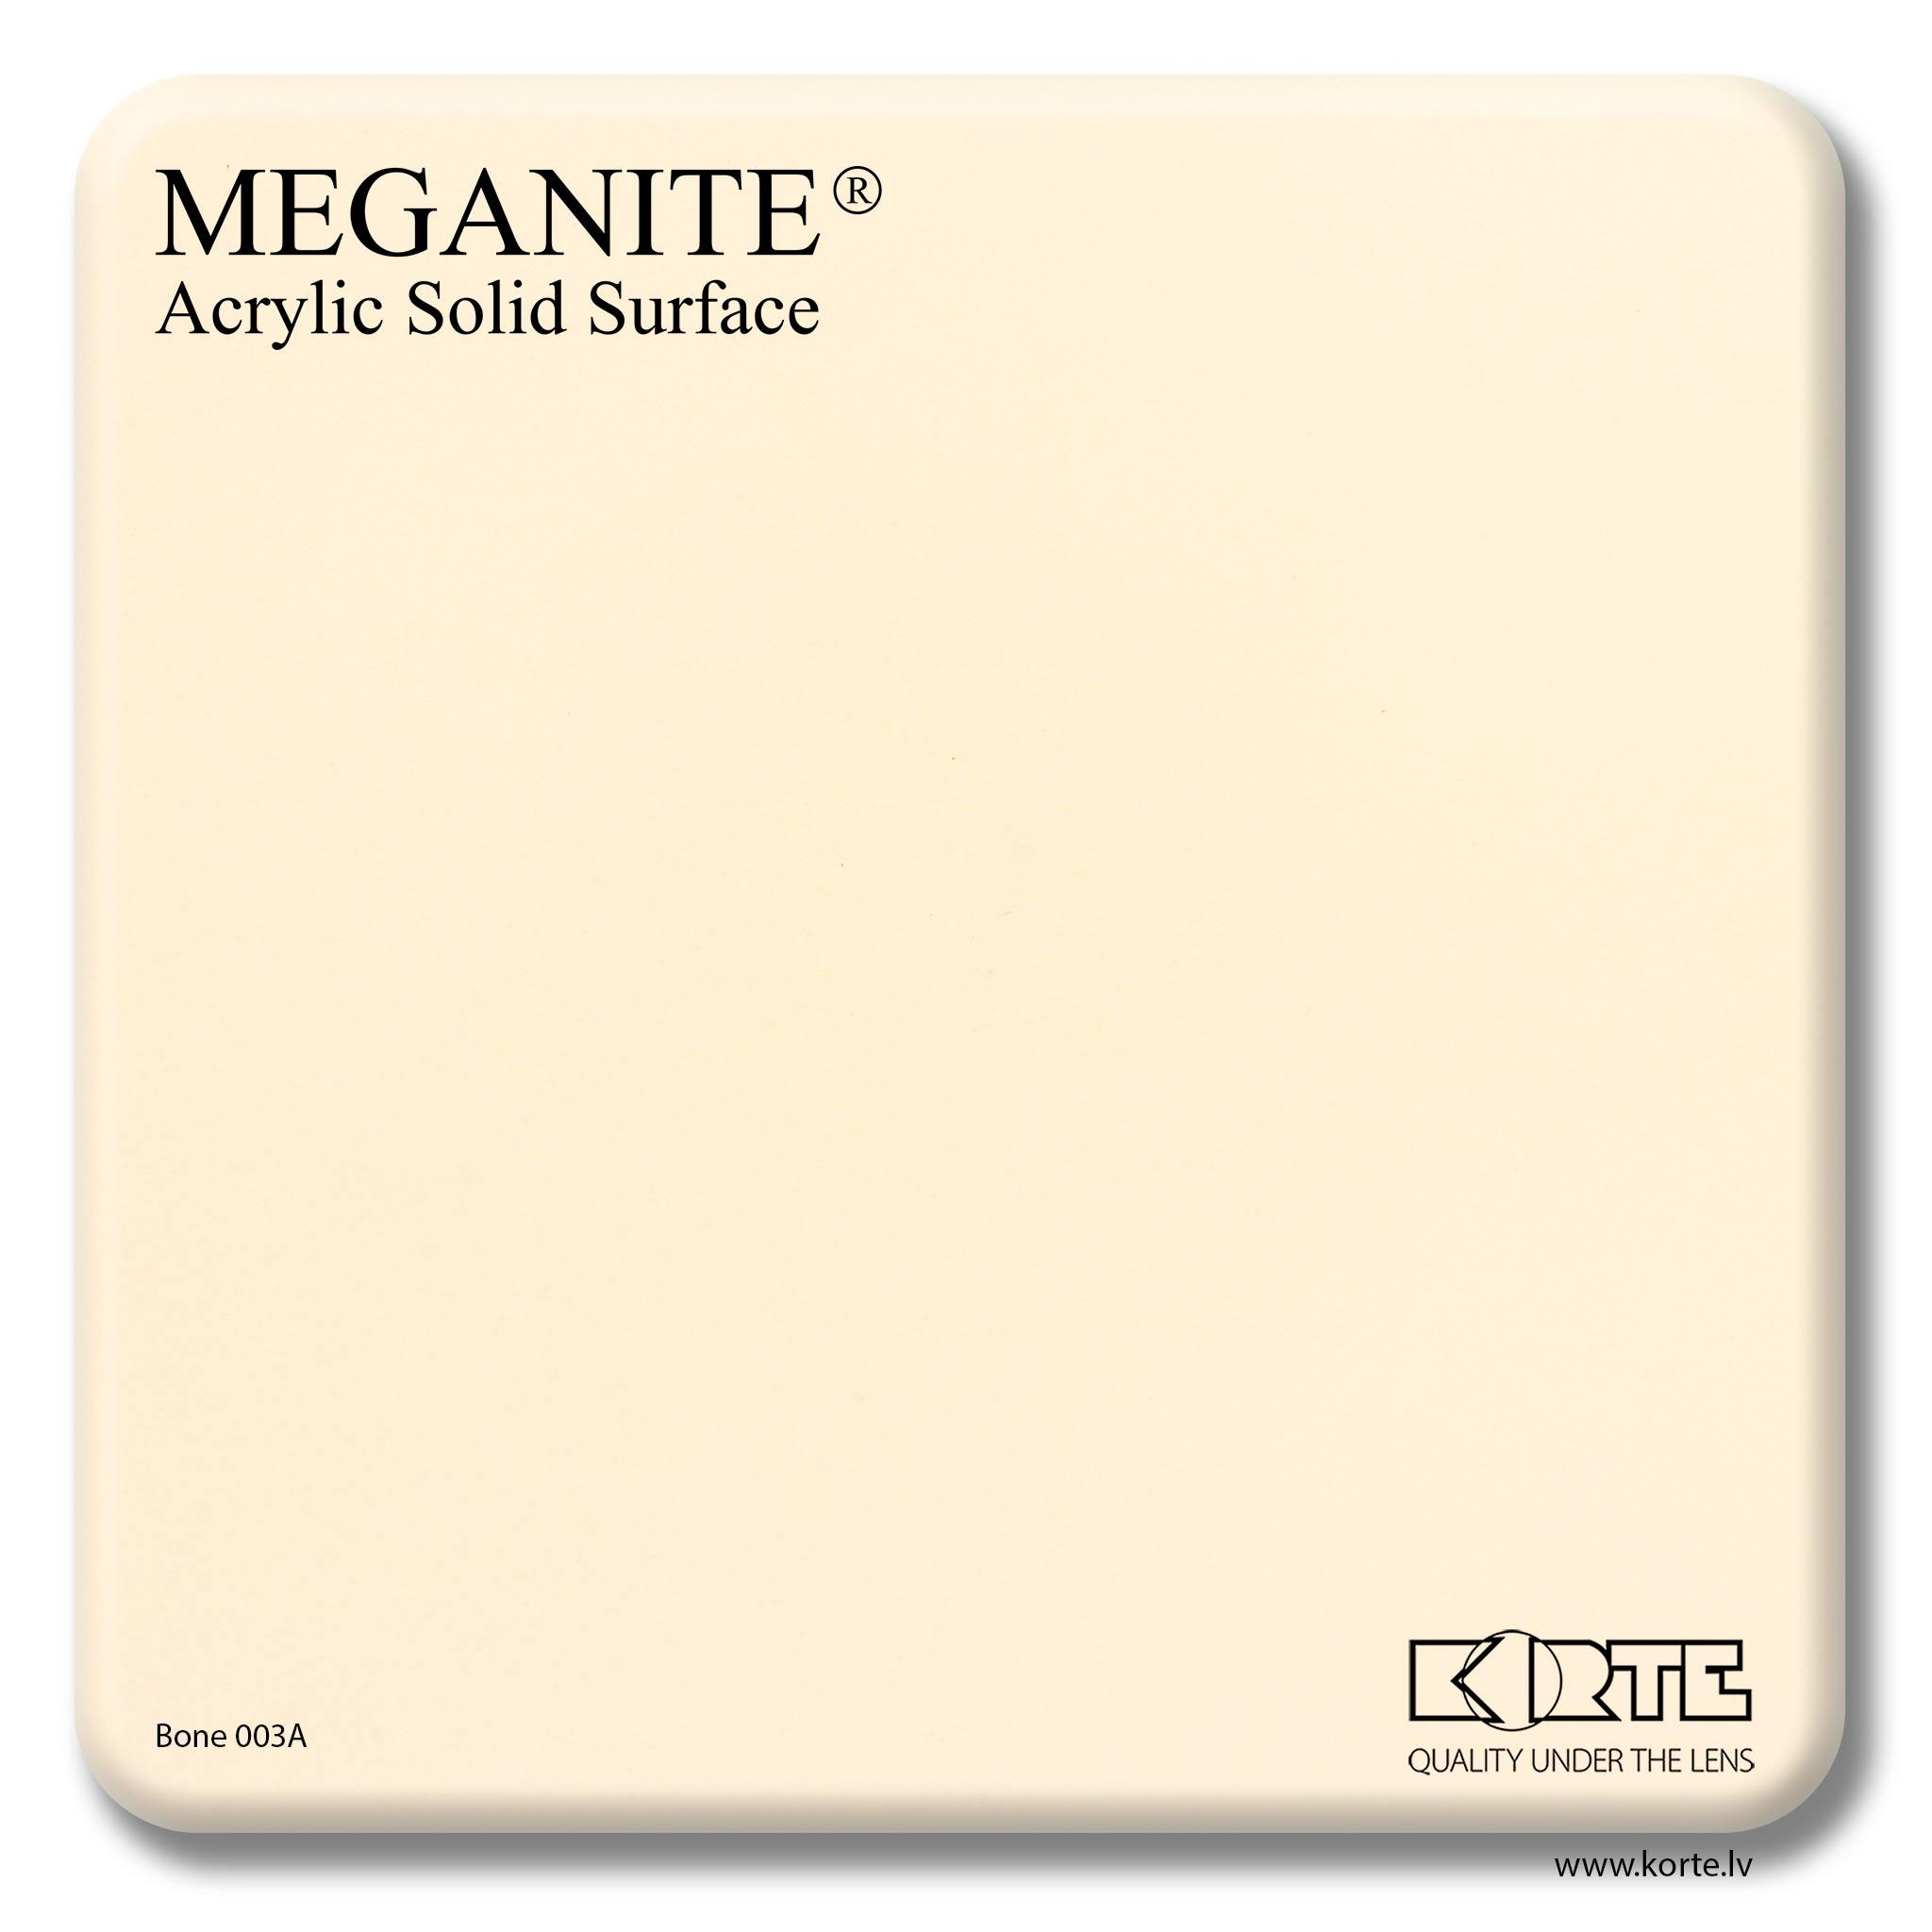 Meganite Bone 003A